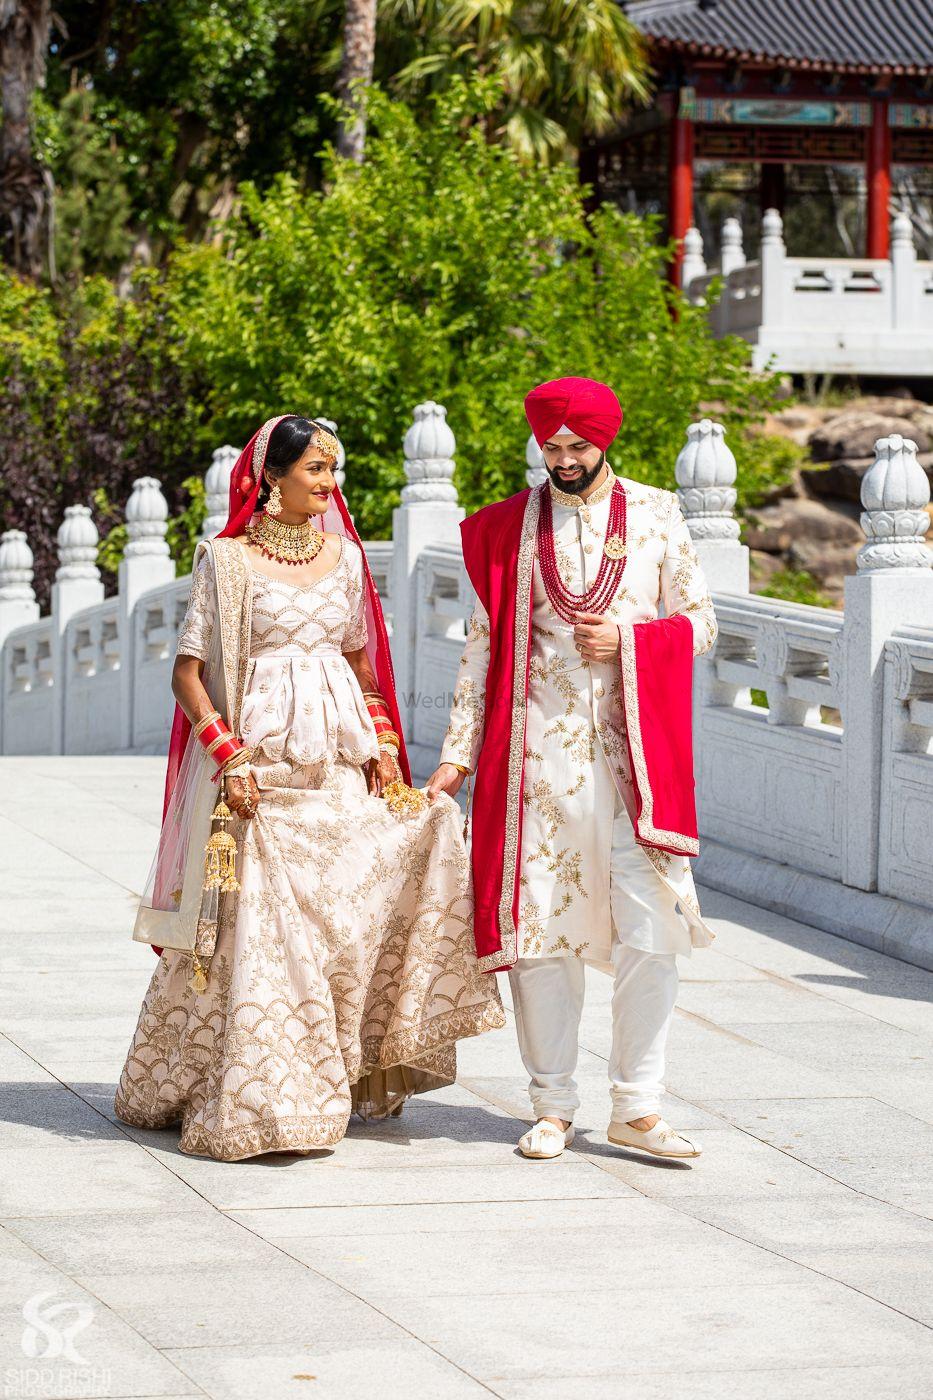 Photo From Sikh wedding - By Kala Shree Regalia